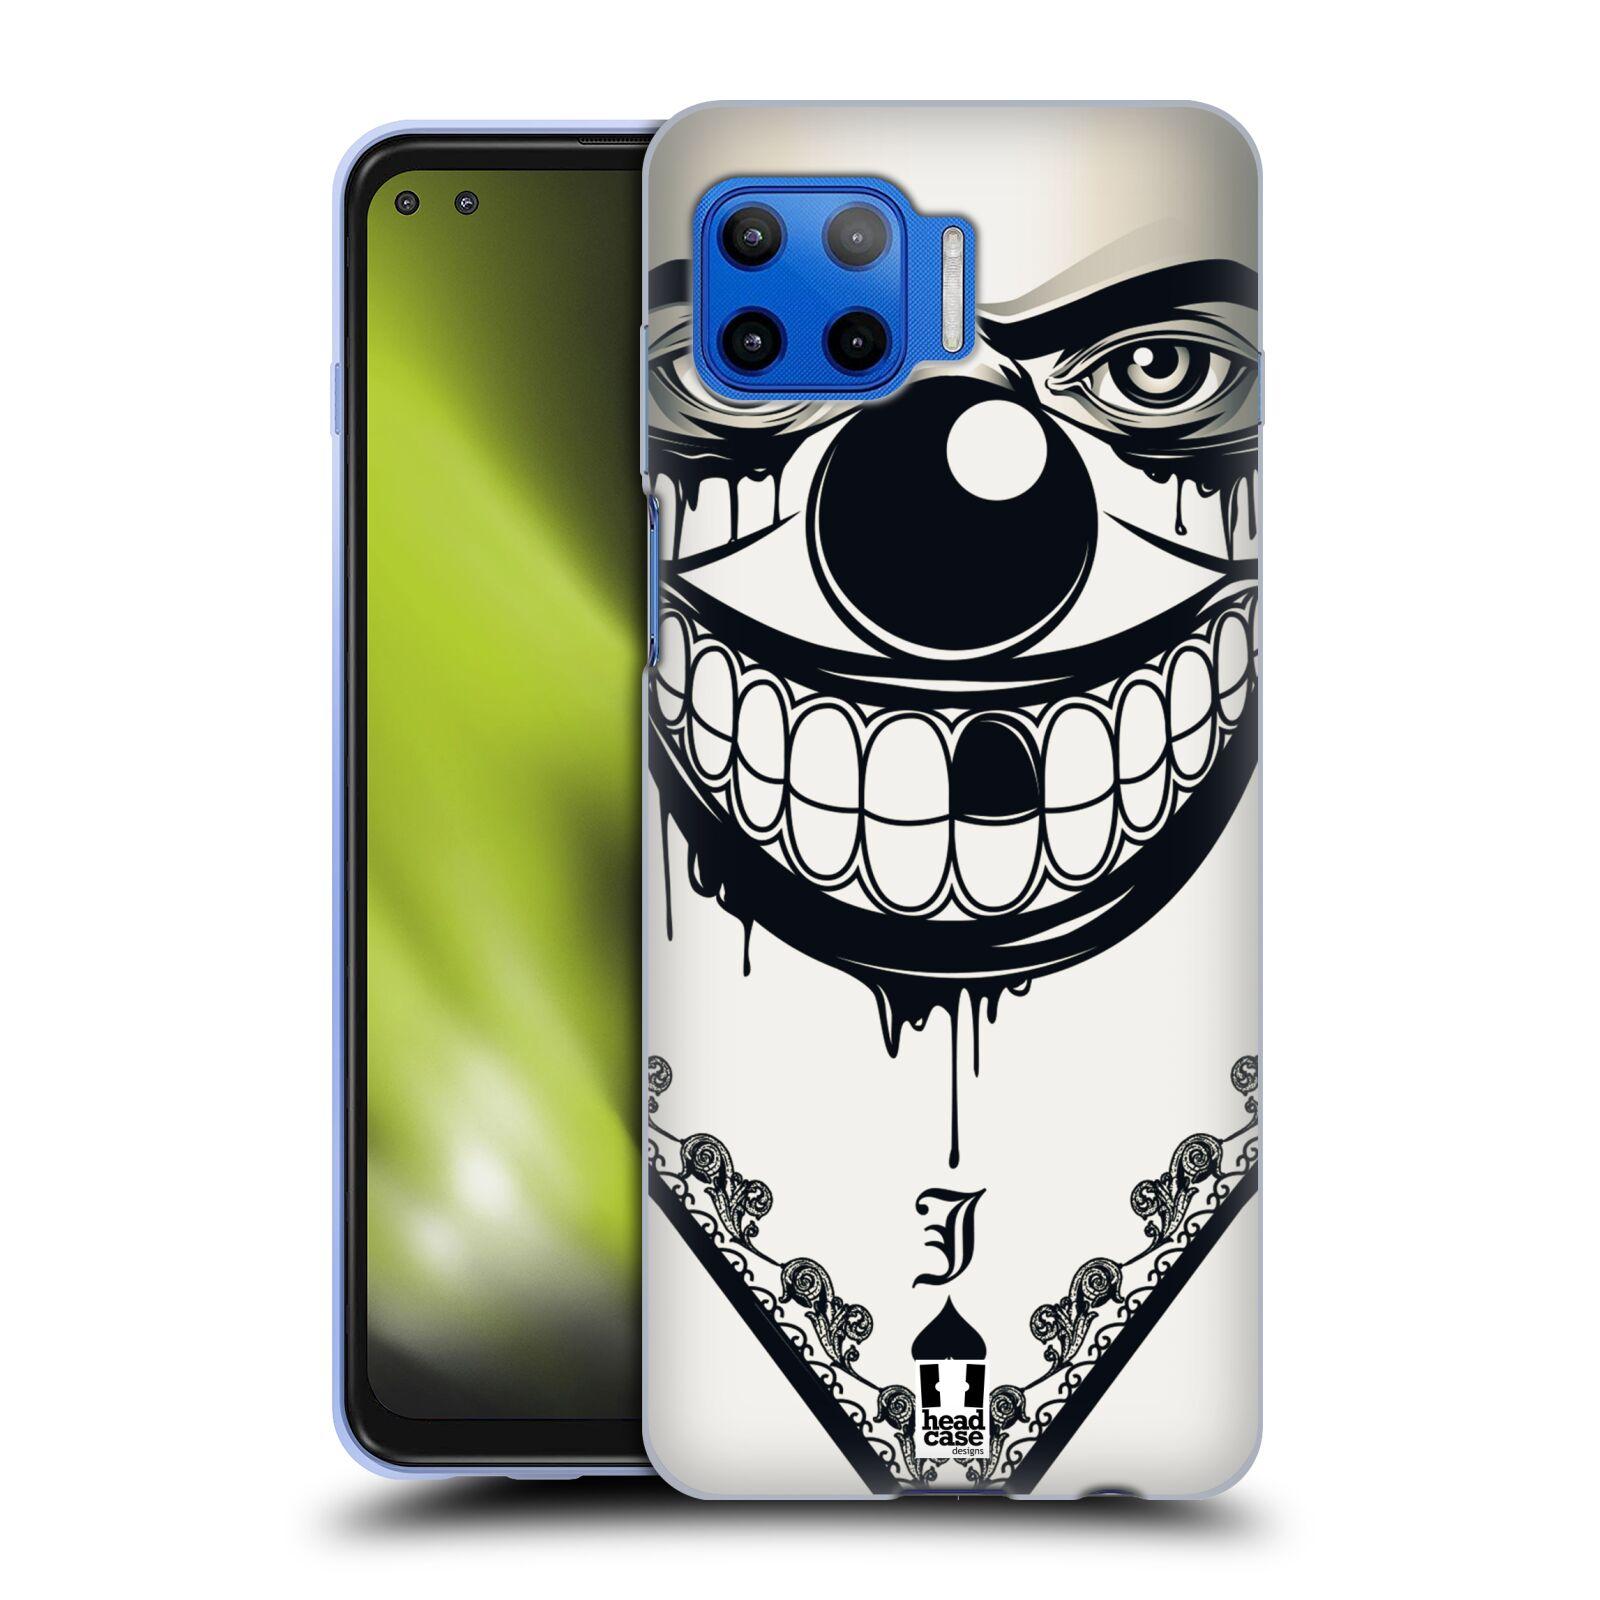 Silikonové pouzdro na mobil Motorola Moto G 5G Plus - Head Case - ZLEJ KLAUN